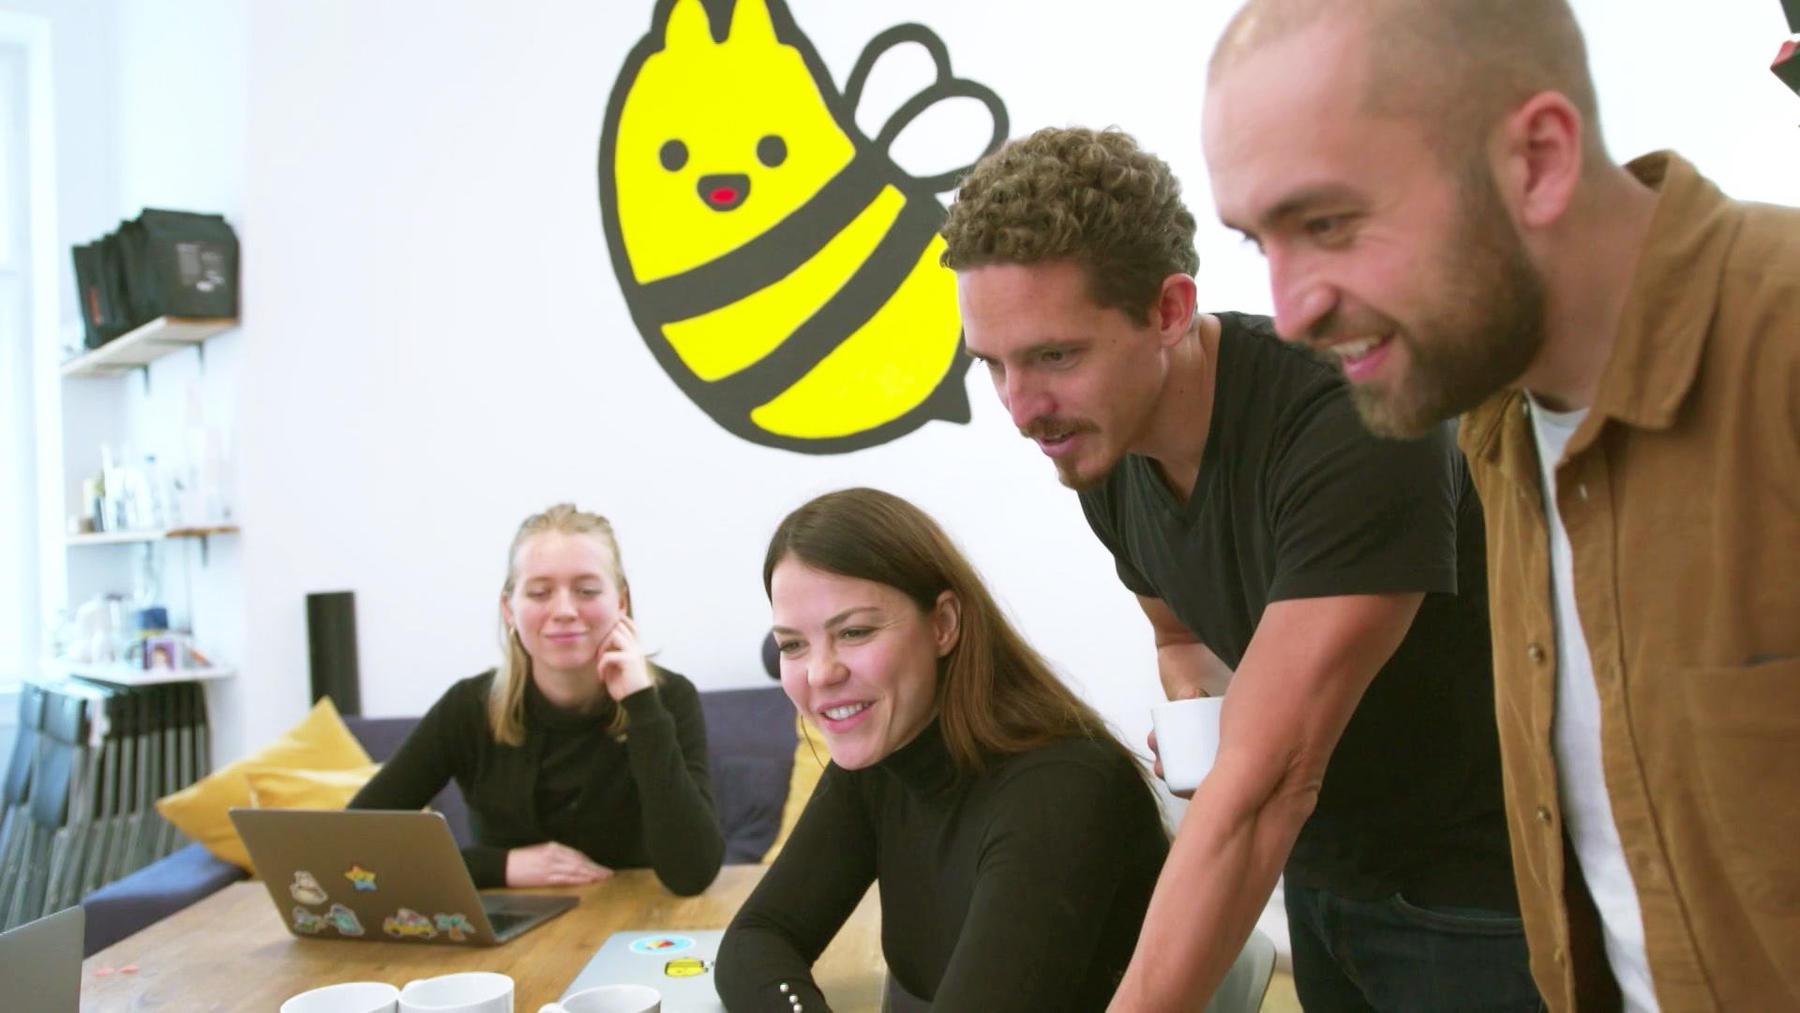 Online Sprachkurse - Chatterbug & Babbel | Folge 36